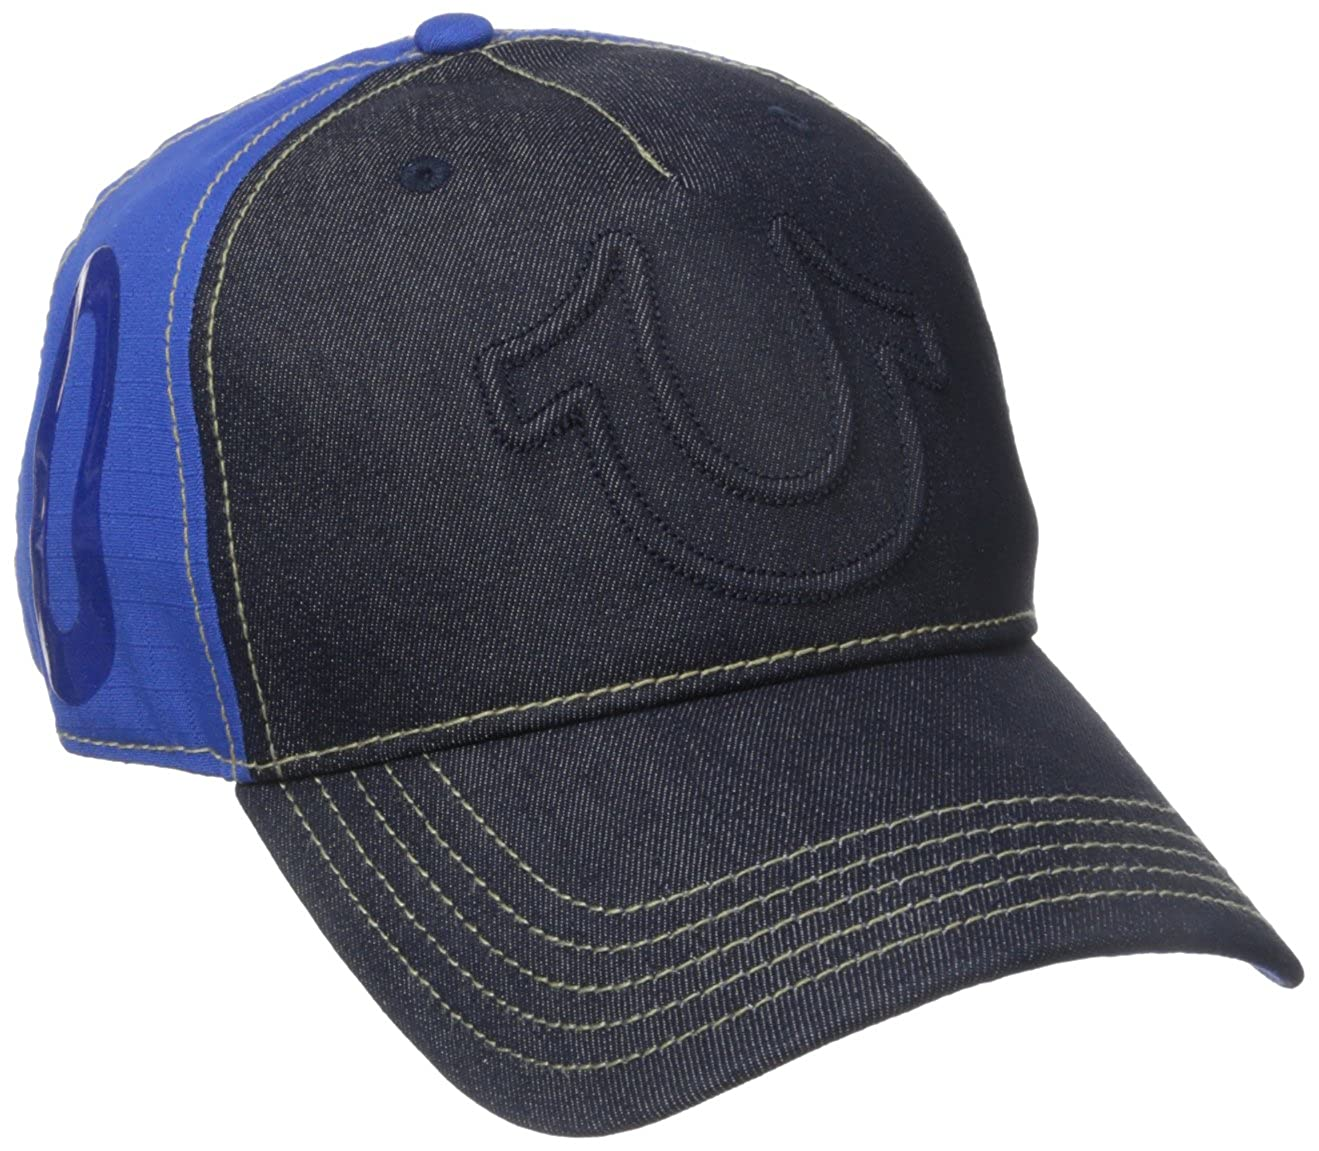 0a710150a2b1fe Amazon.com: True Religion Men's Raised Horseshoe Baseball Cap, Dark Indigo,  One Size: Clothing